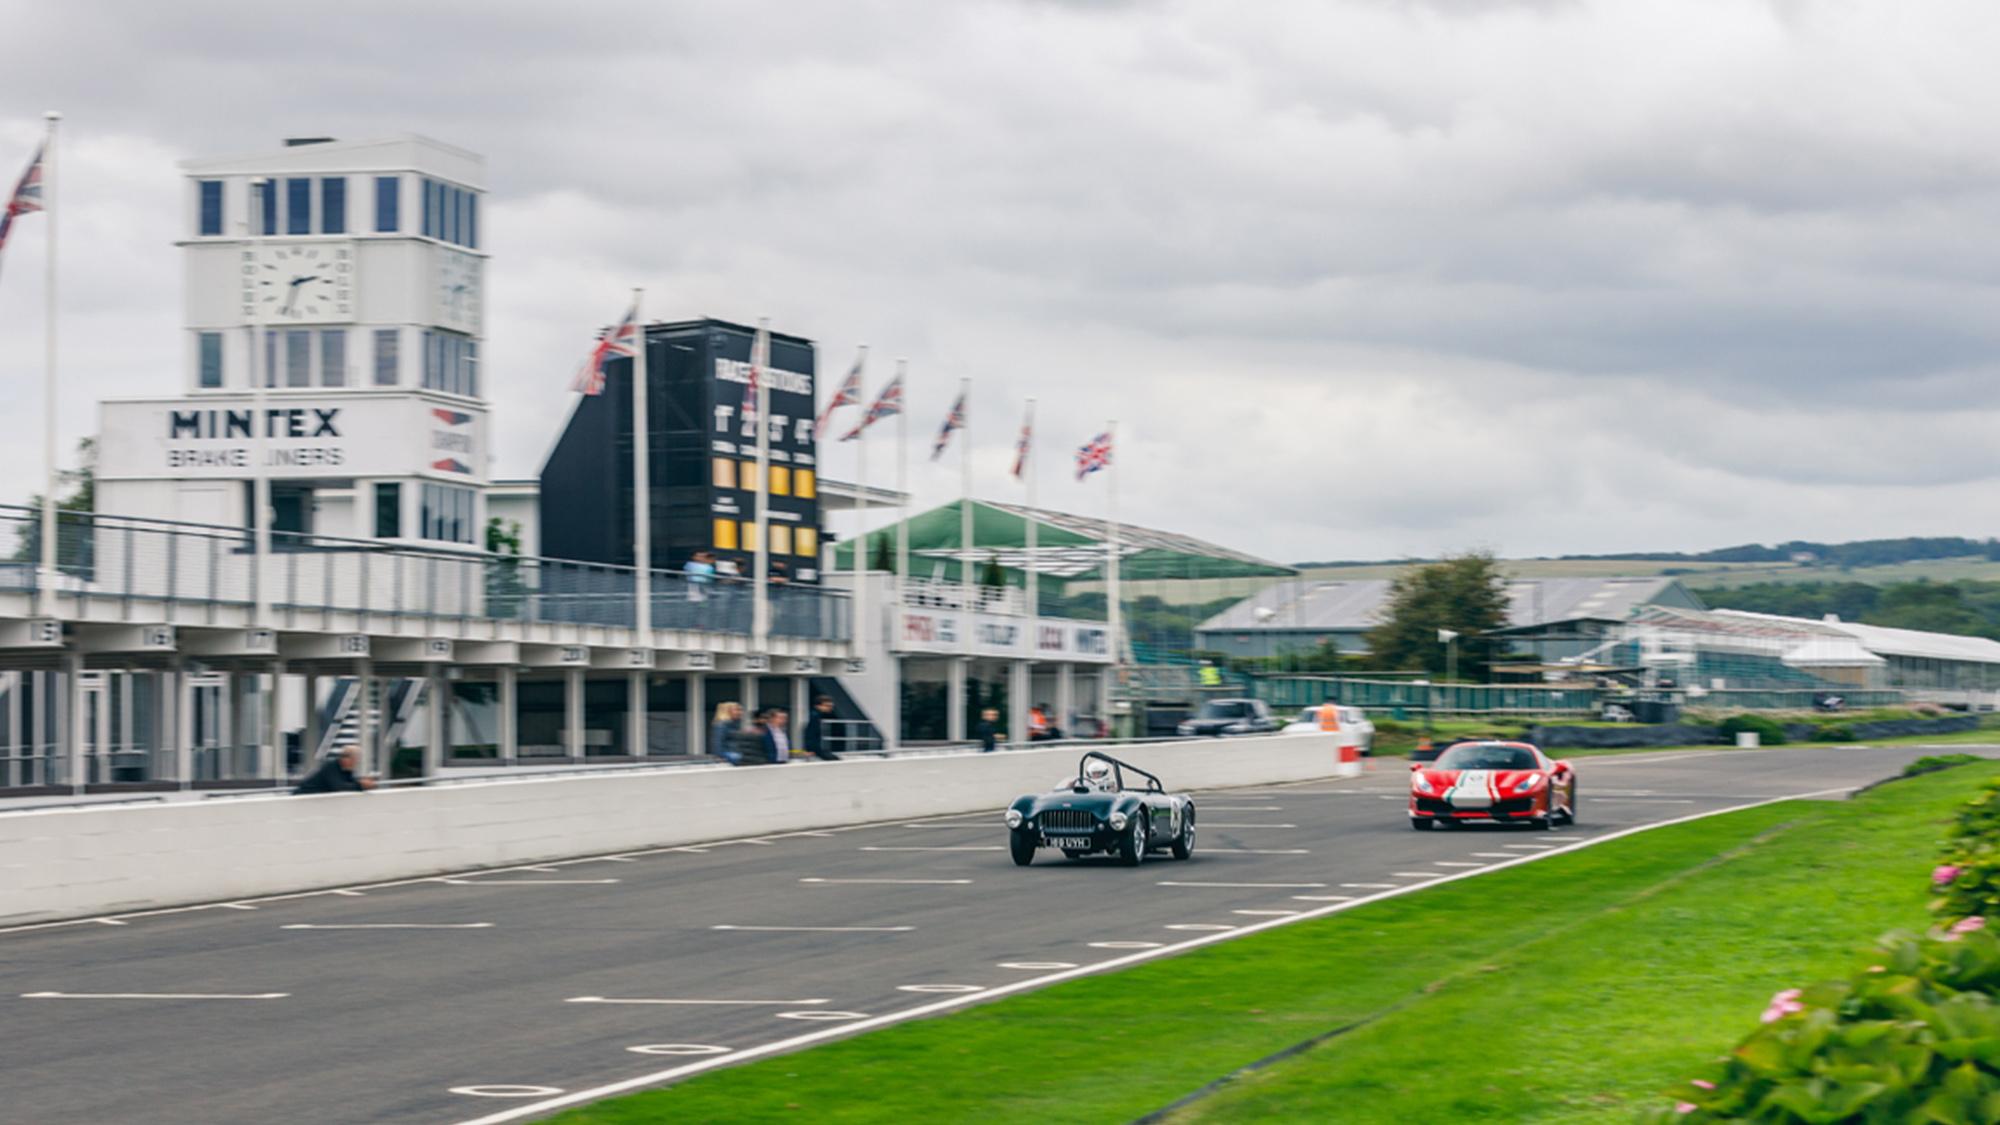 2021 Motor Sport track day Ferrari 458 Speciale